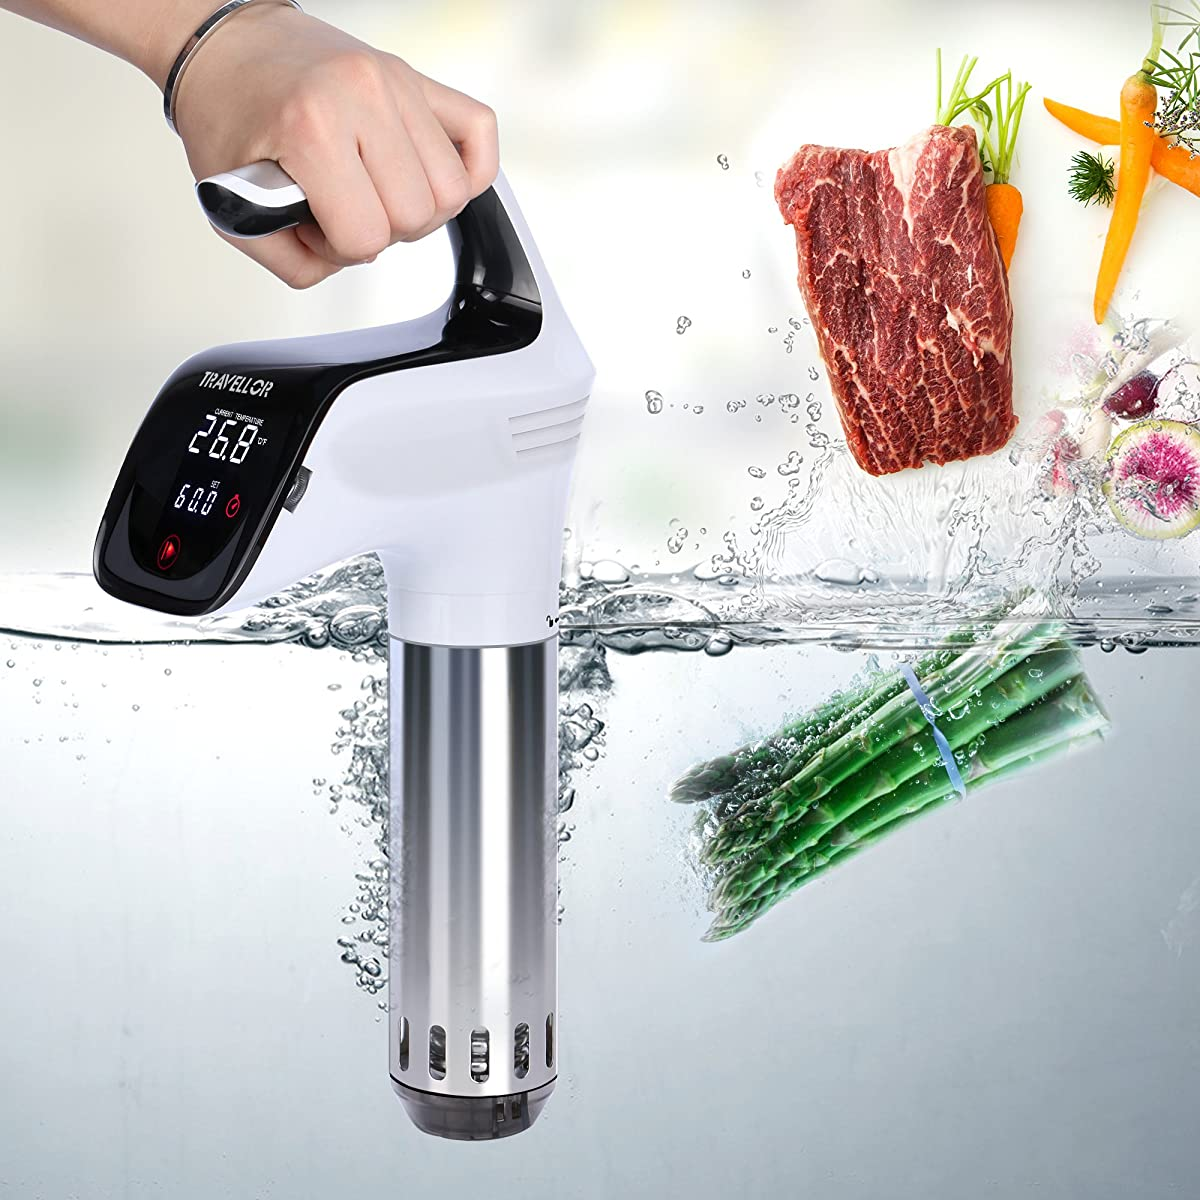 Sous Vide Travellortech Precision Cooker Immersion Circulator ,120V 850 Watts White